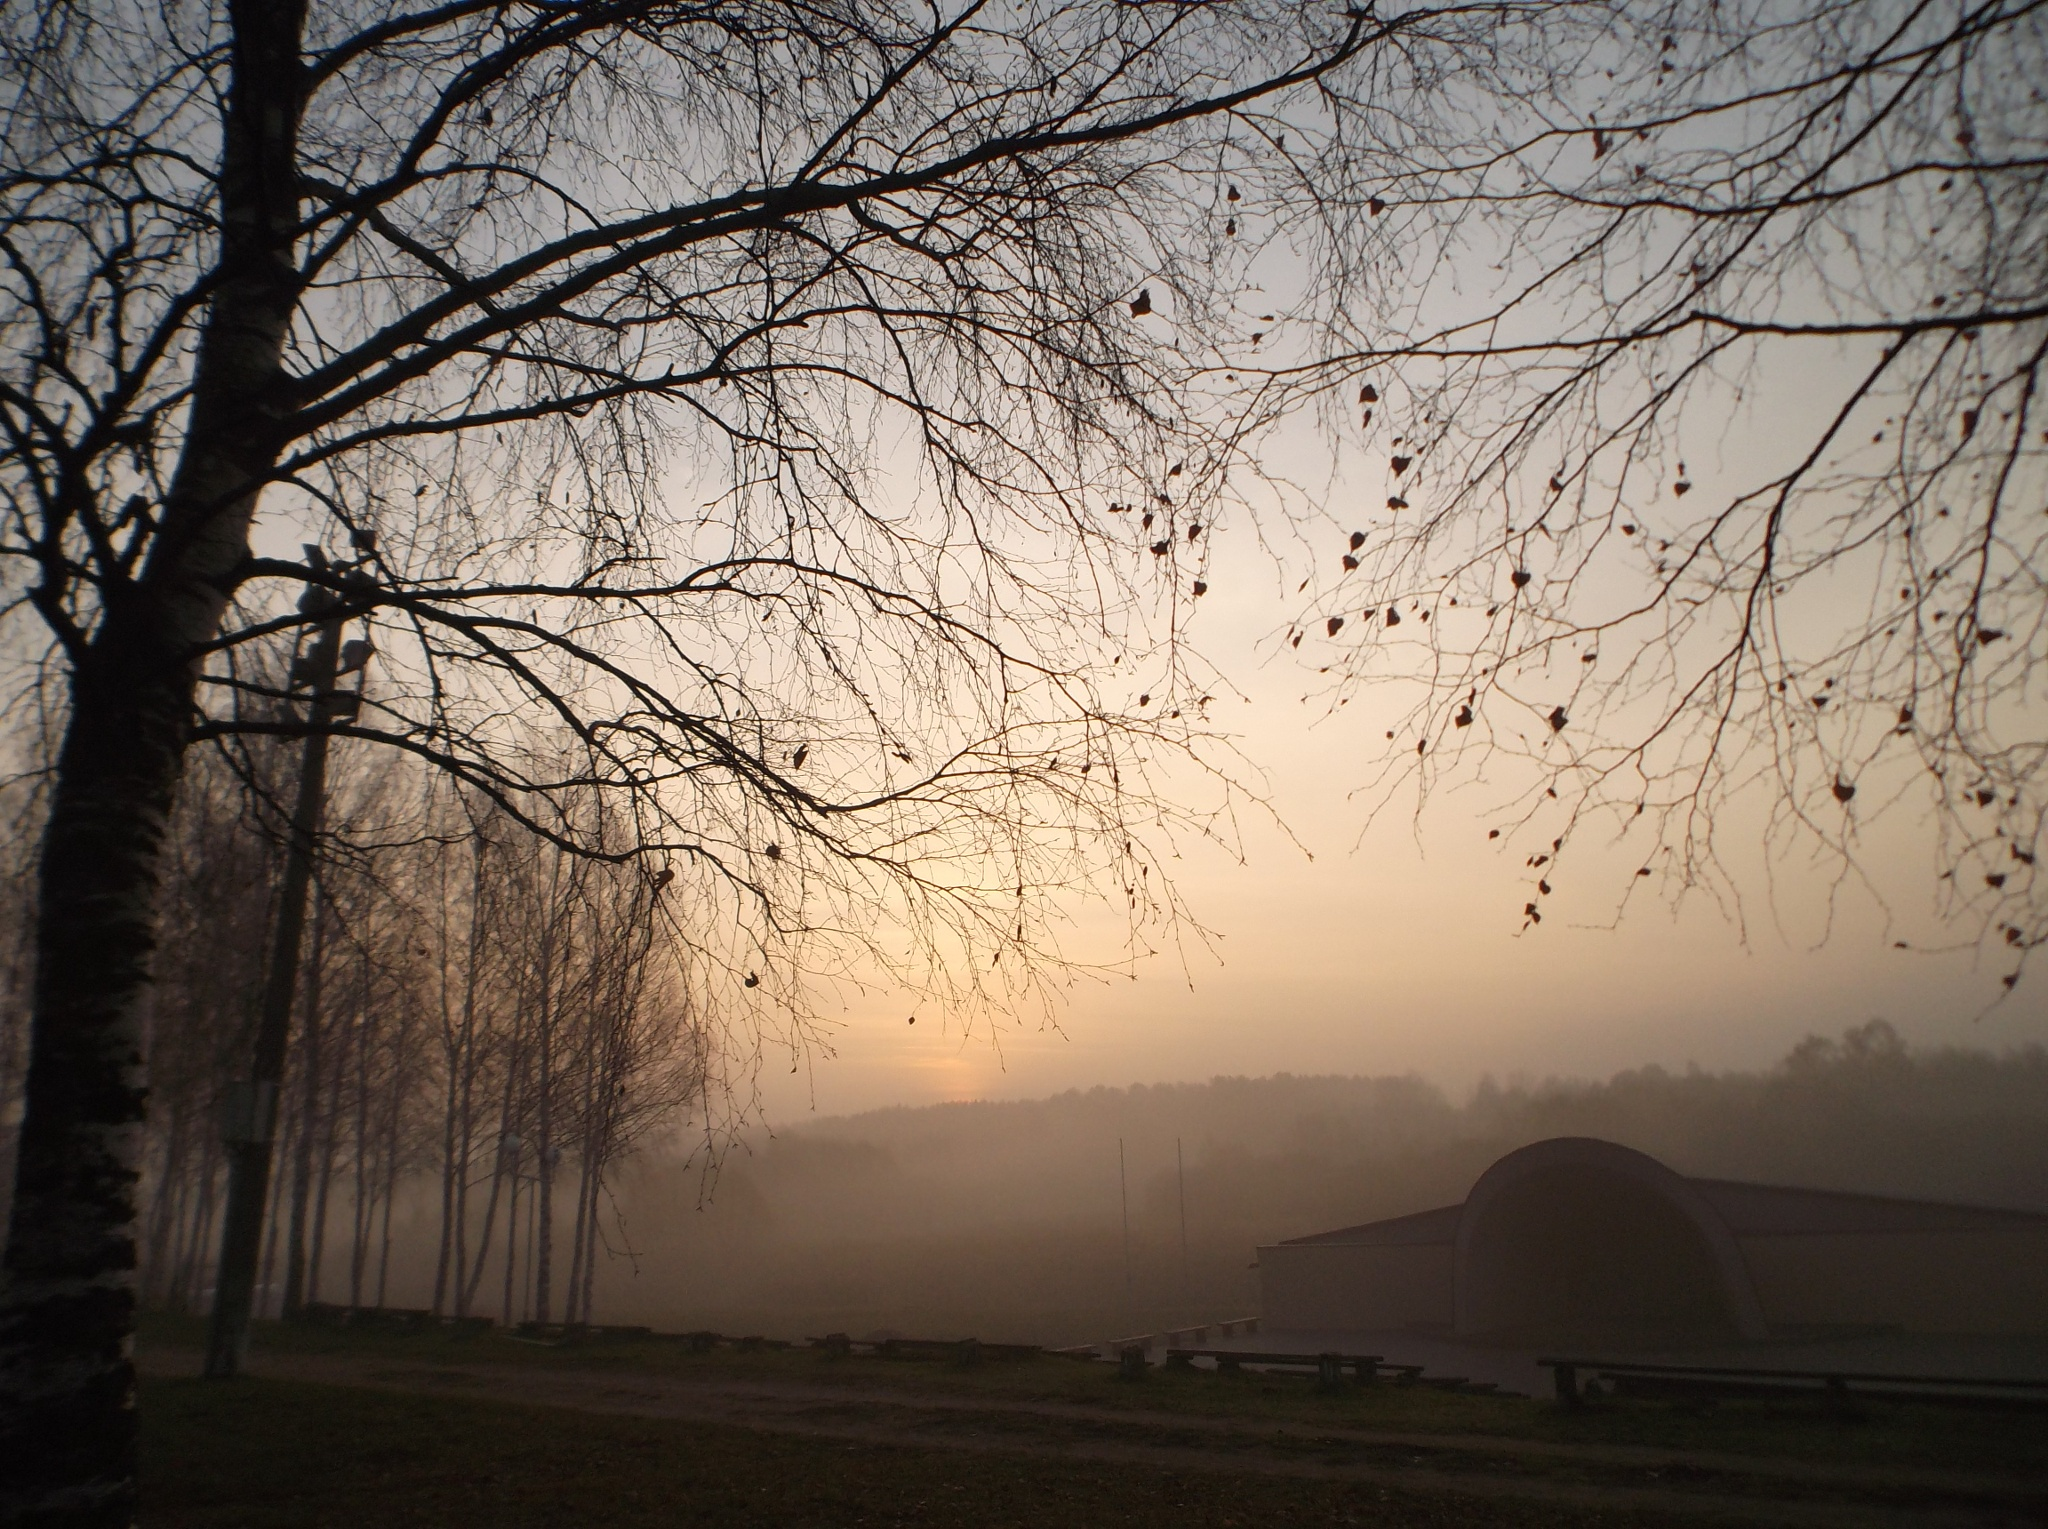 Morning before sunrise by uzkuraitiene62